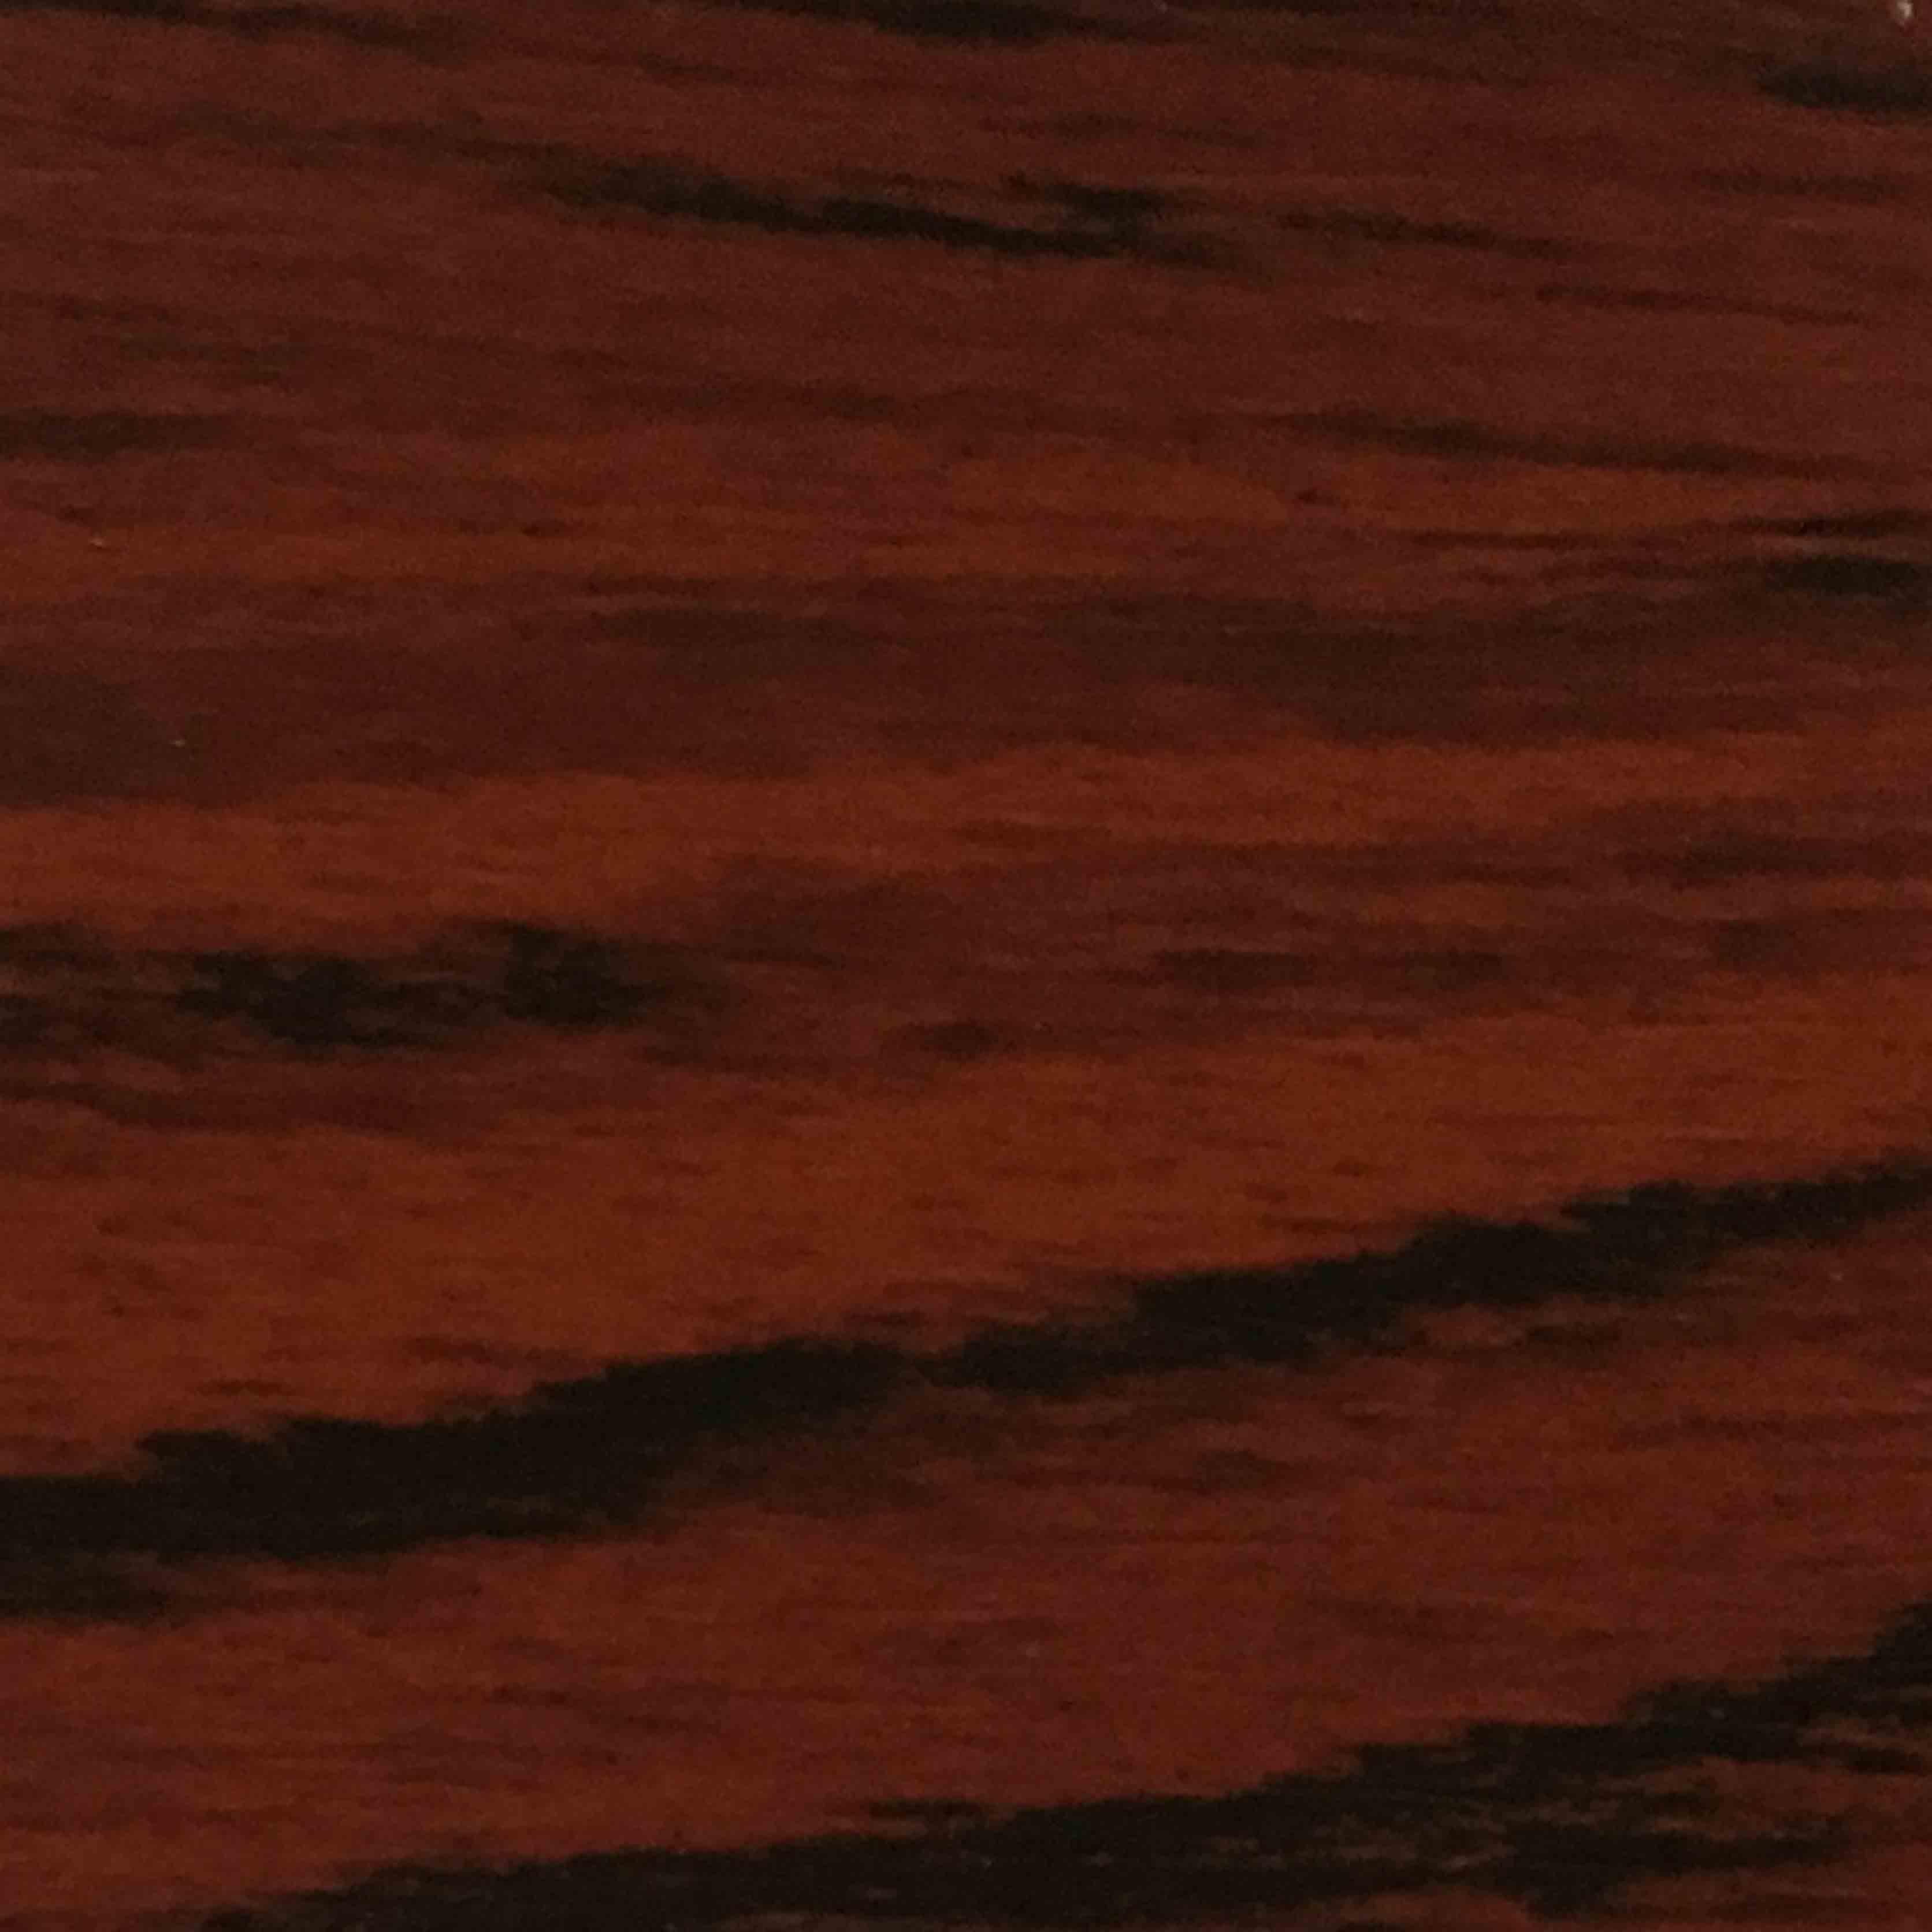 Decal vân gỗ - 3047